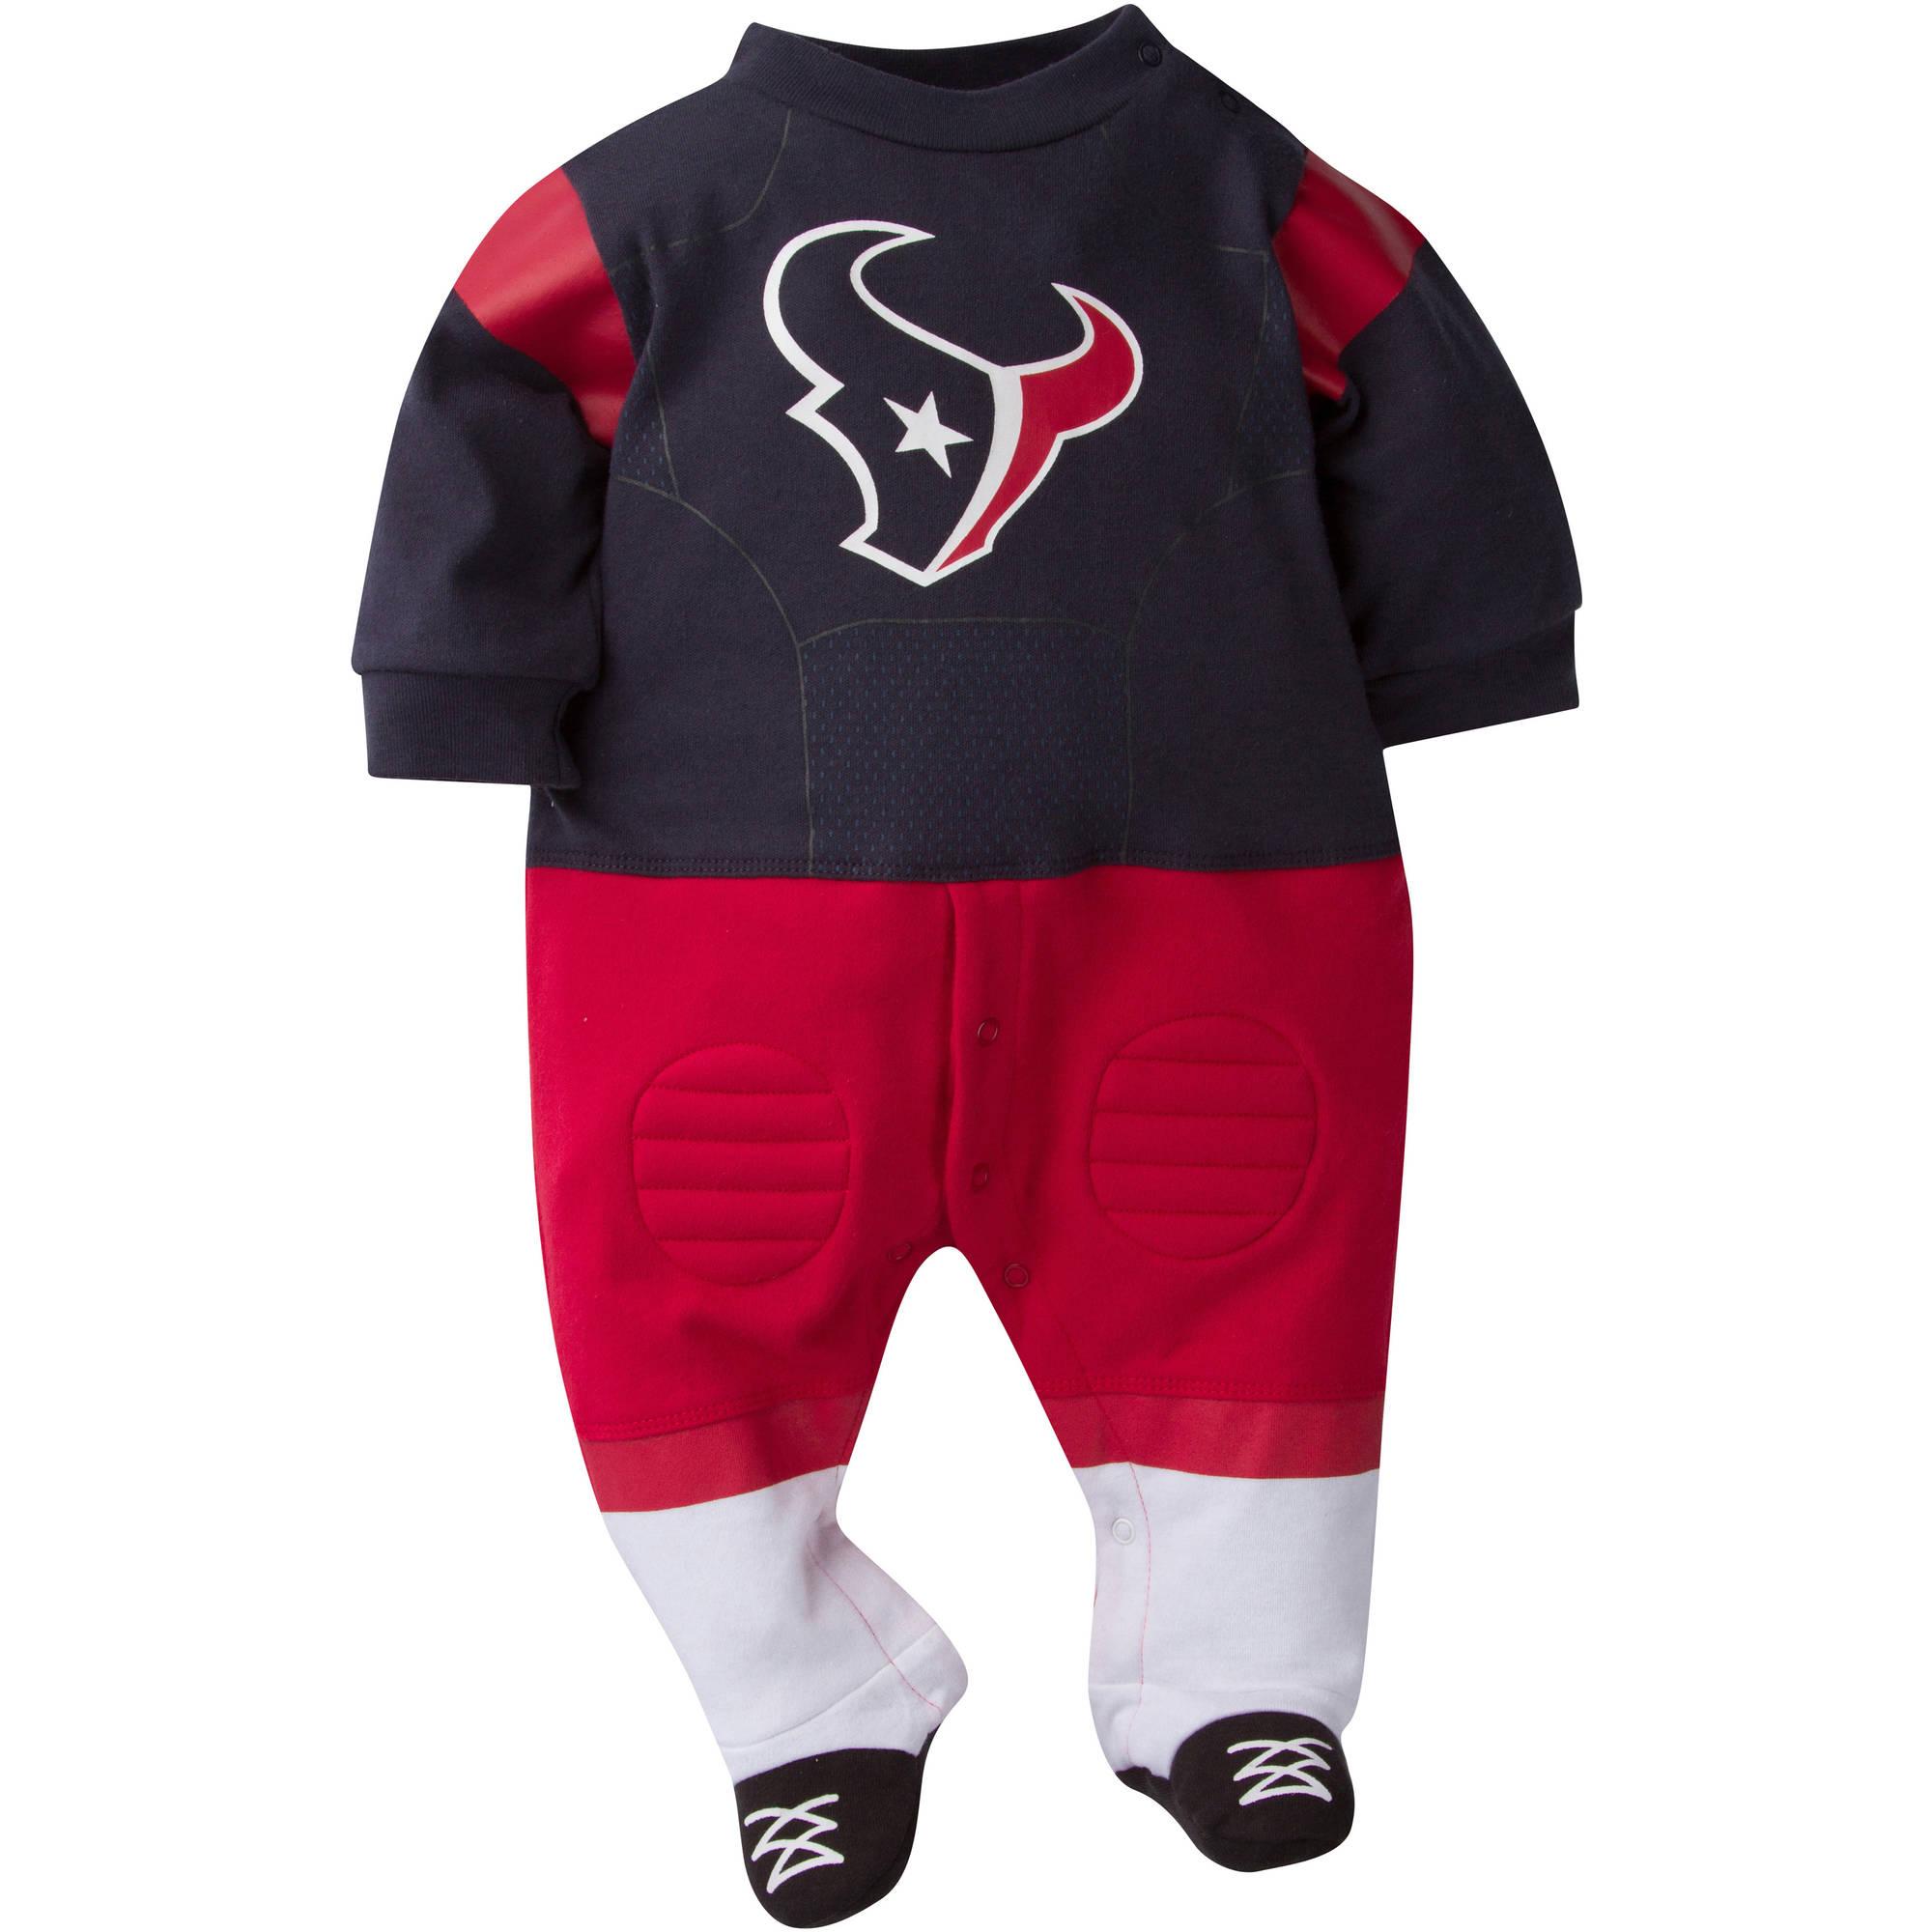 NFL Houston Texans Baby Boys Team Uniform Footysuit with Cleats